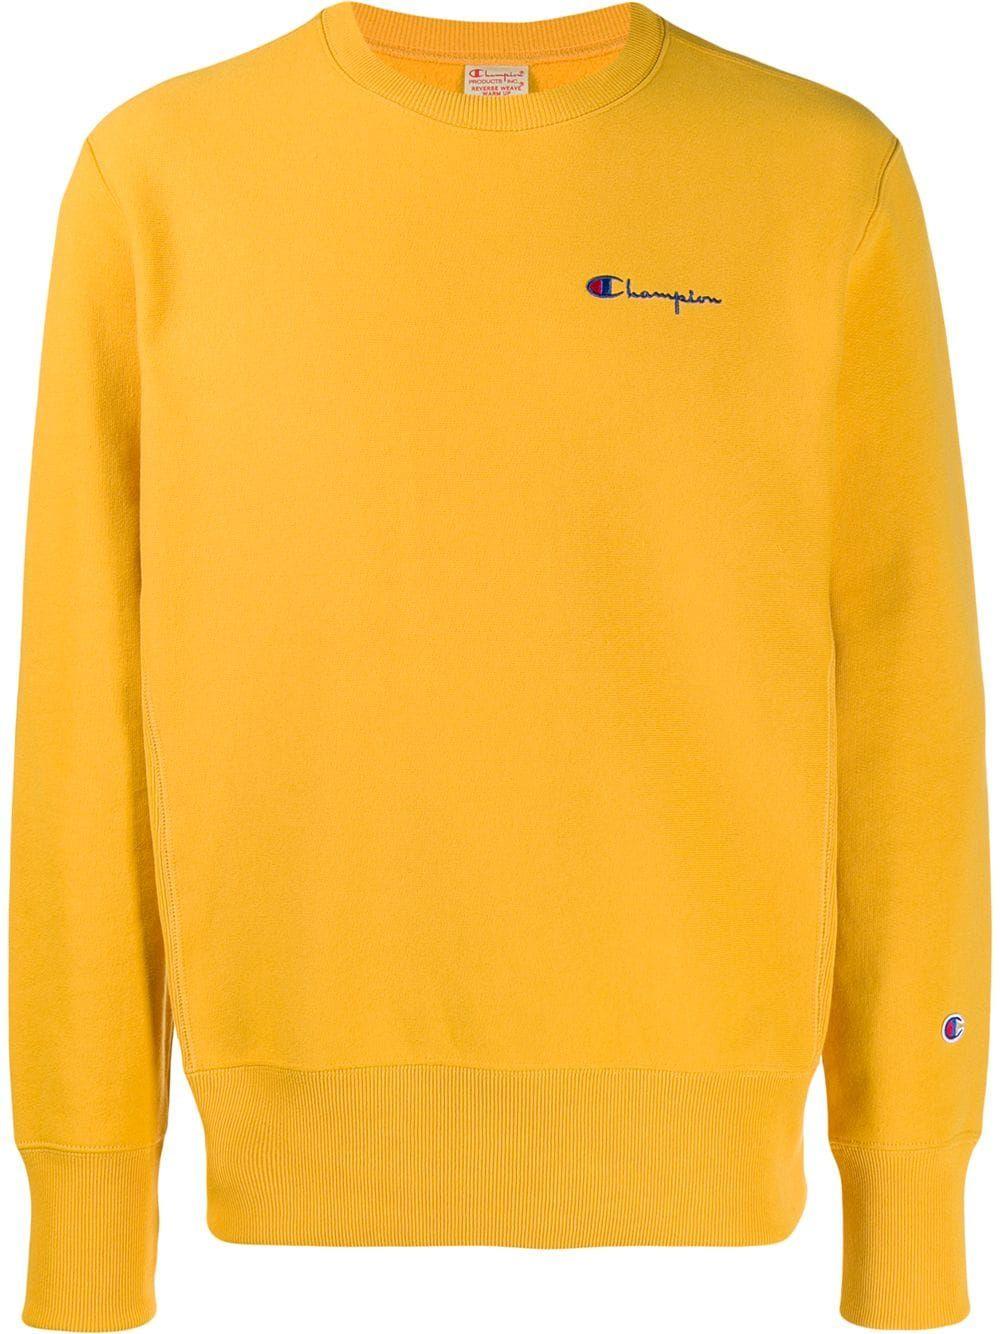 Champion Embroidered Logo Sweatshirt Farfetch Sweatshirts Yellow Champion Sweatshirt Eyes Sweatshirt [ 1334 x 1000 Pixel ]